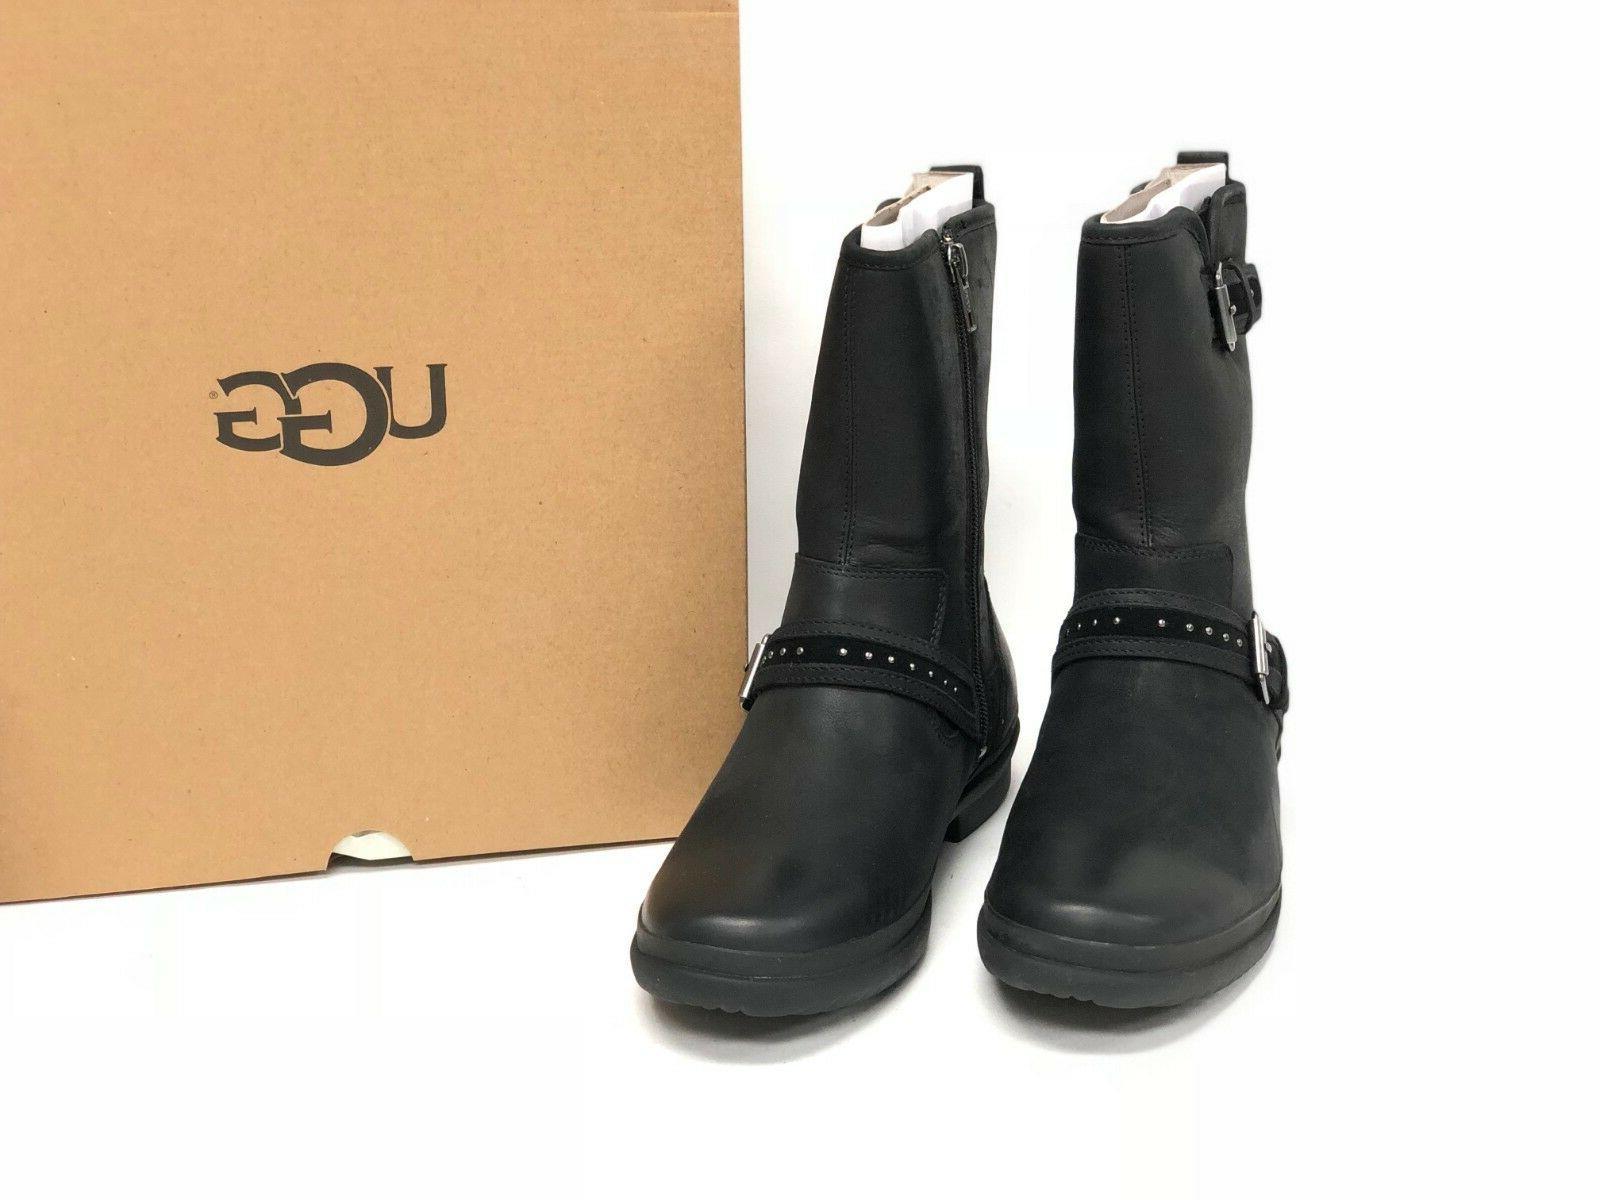 Ugg Australia Black Stud Waterproof